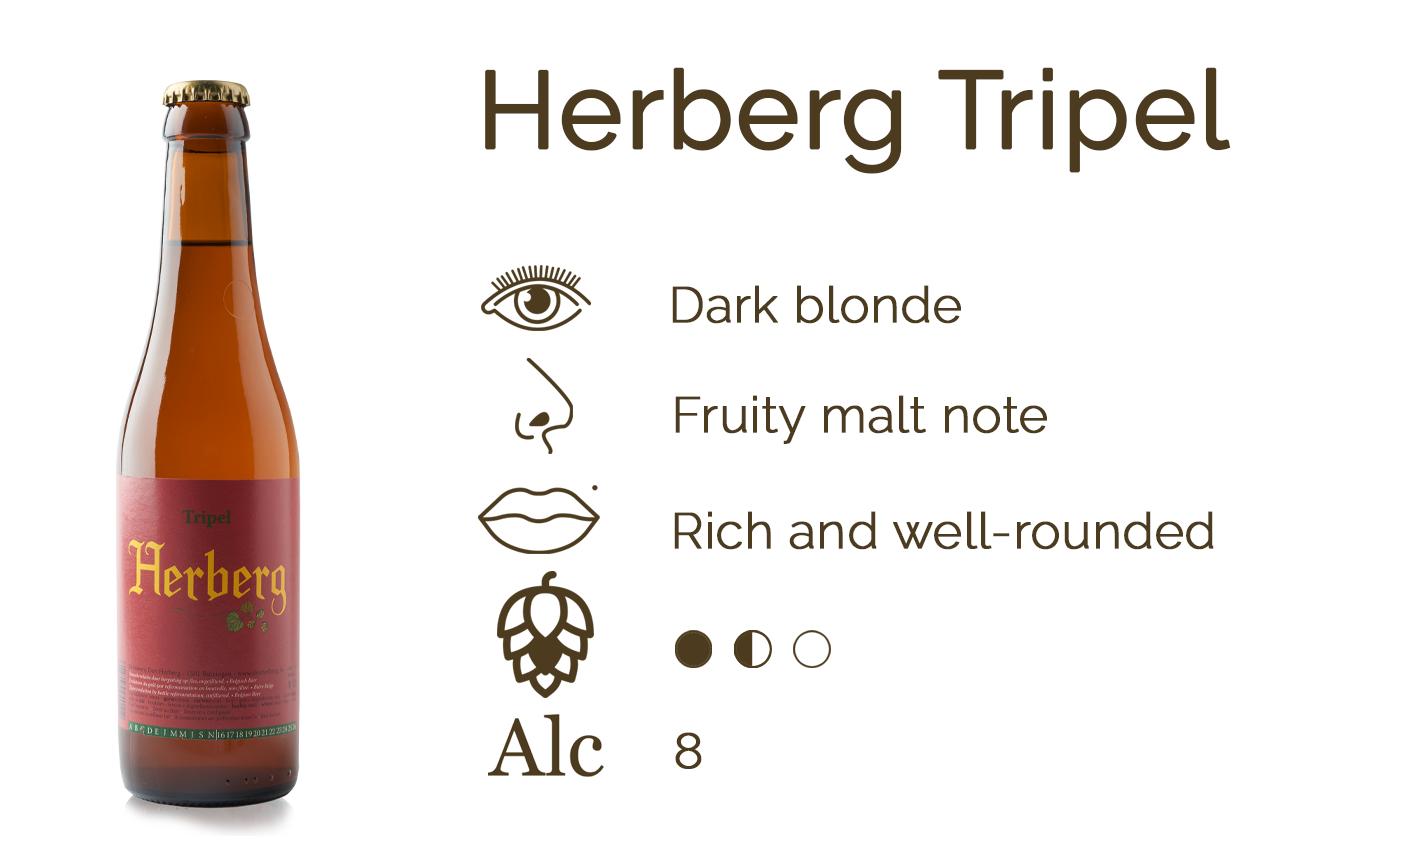 Smaakfiche voorstel 3 Herberg tripel_eng_aangep